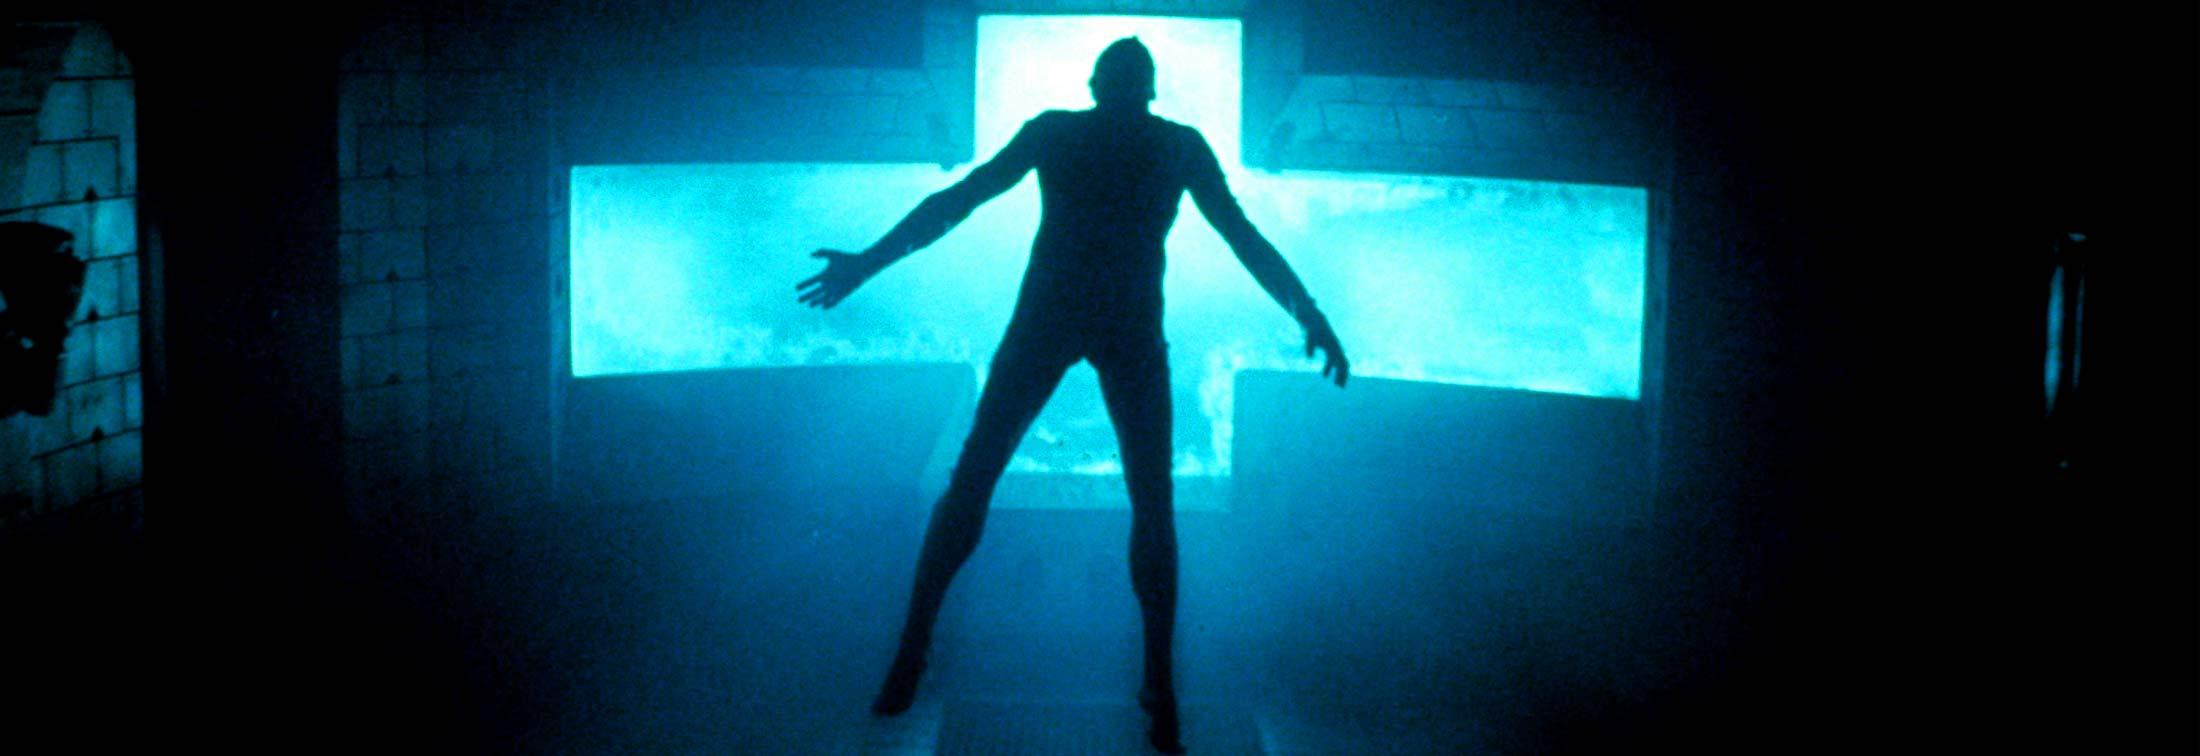 Event Horizon - Revisiting the sci-fi horror cult classic